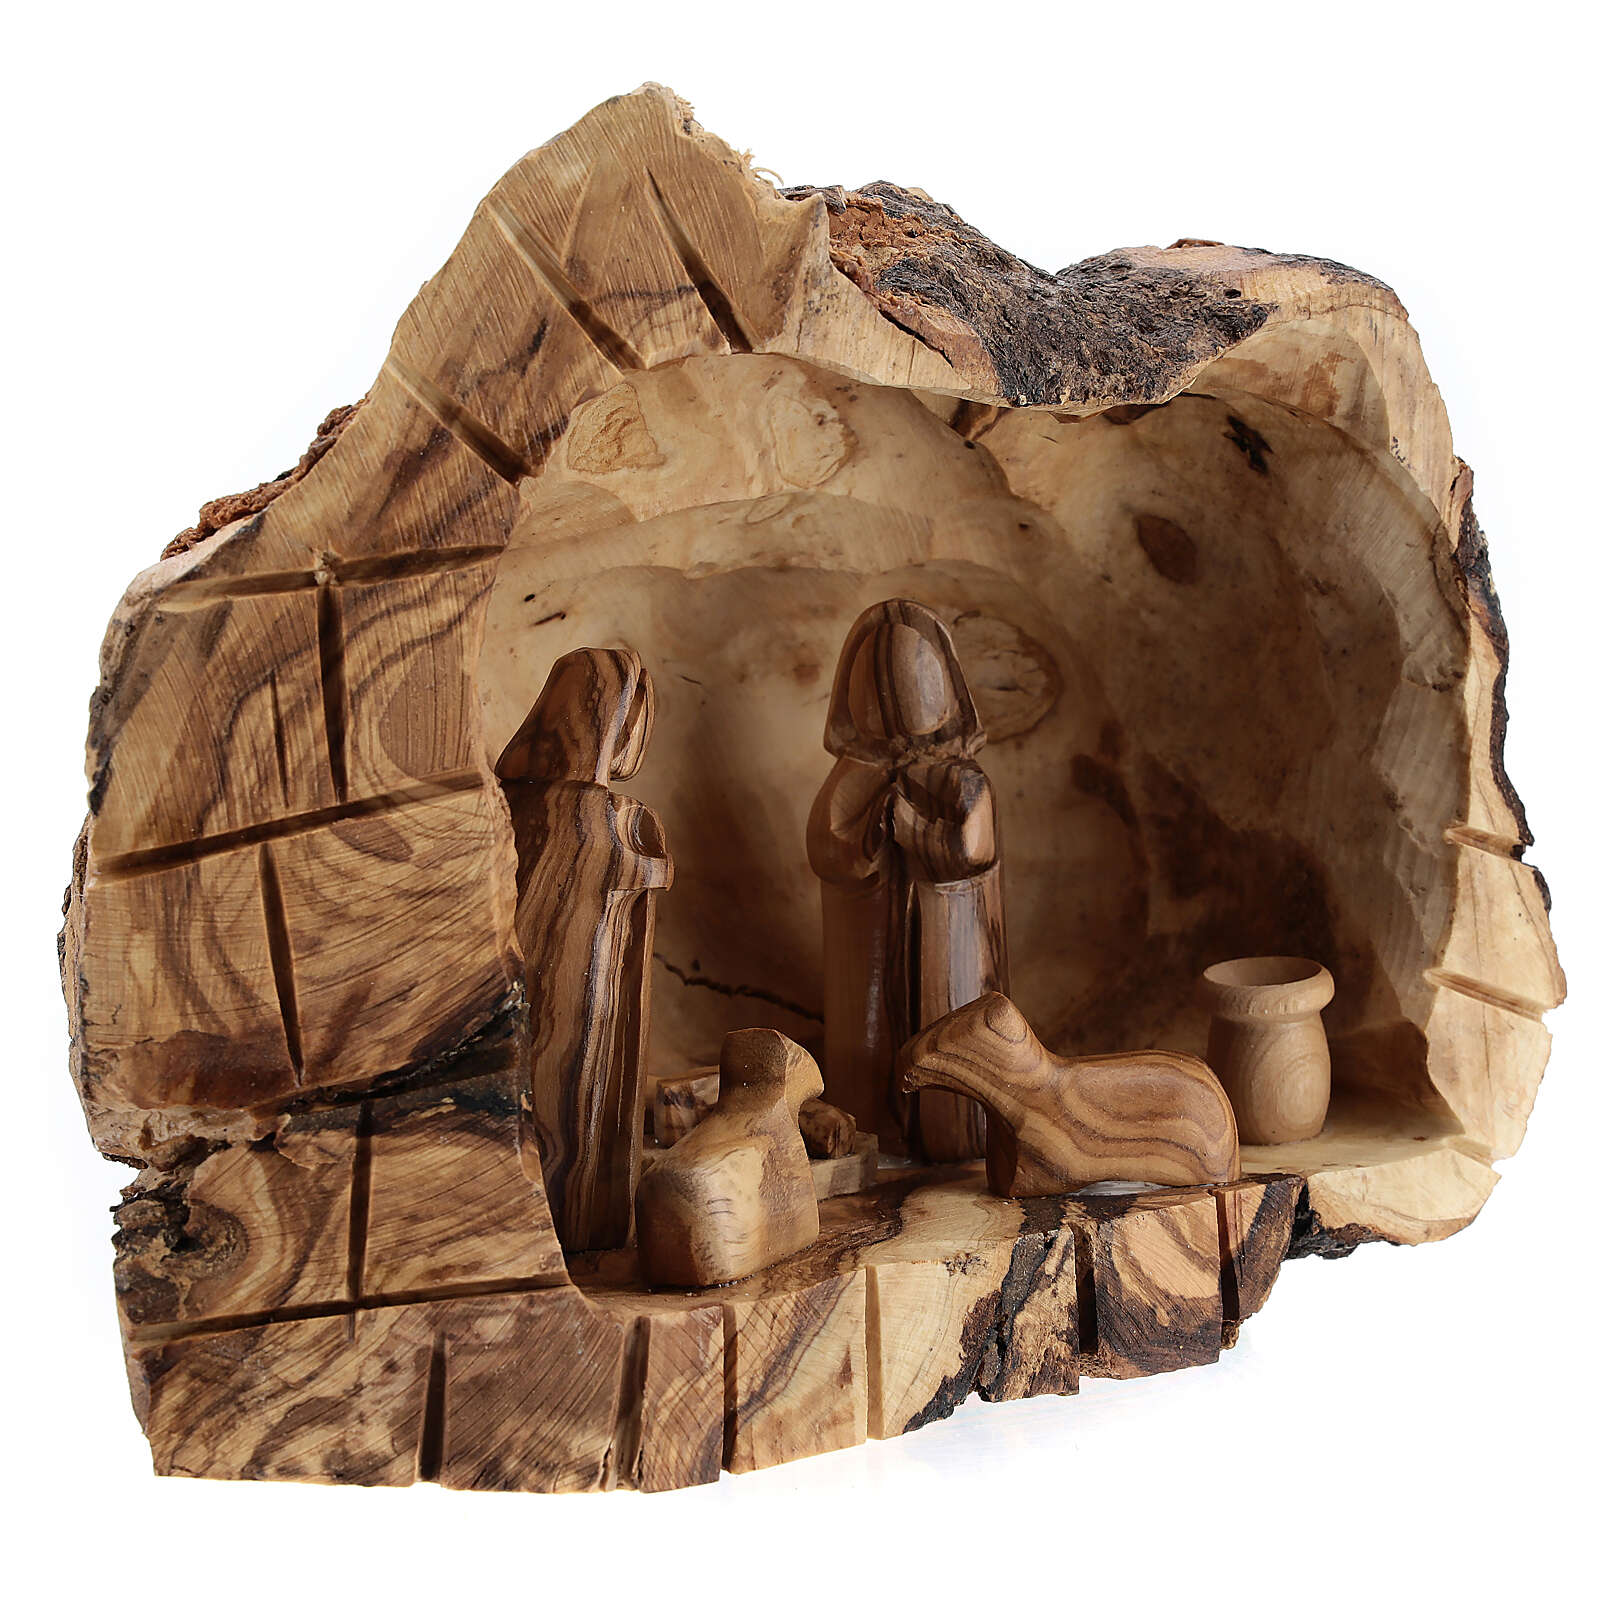 Grotta legno naturale Natività 6 cm ulivo Betlemme 15x20x10 cm 4